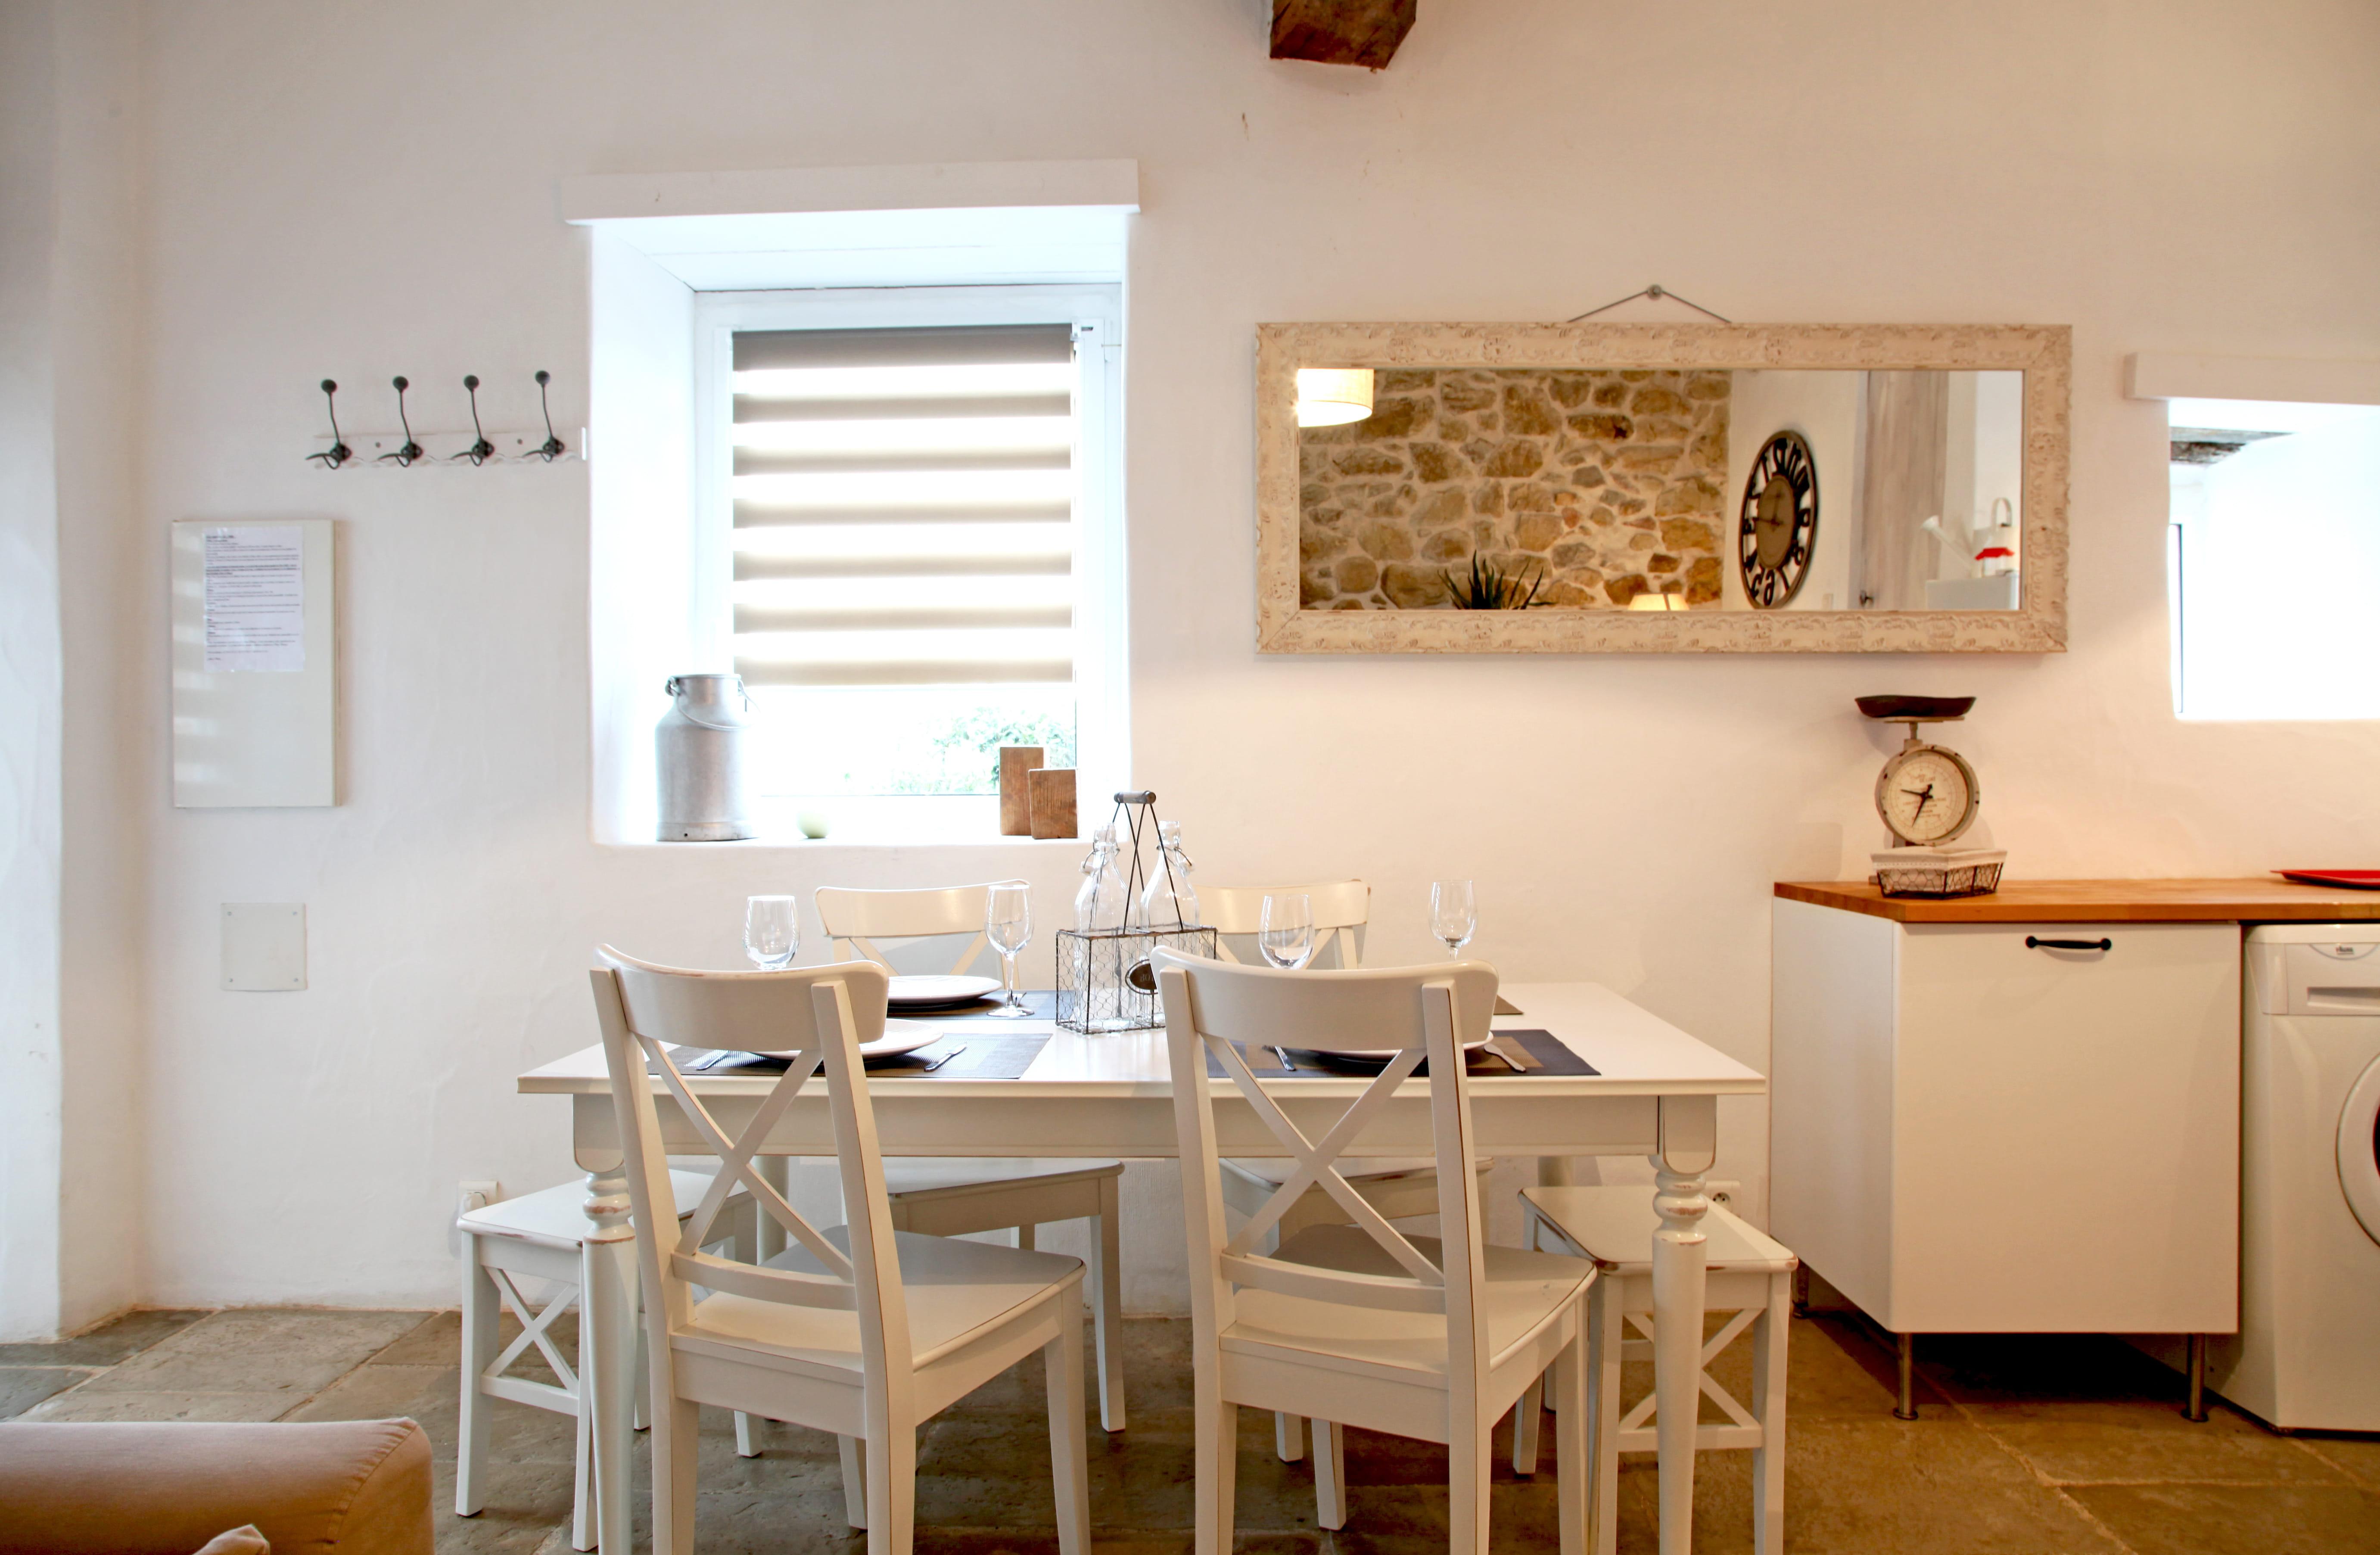 Deco cuisine campagne rouge - Cuisine style bord de mer ...